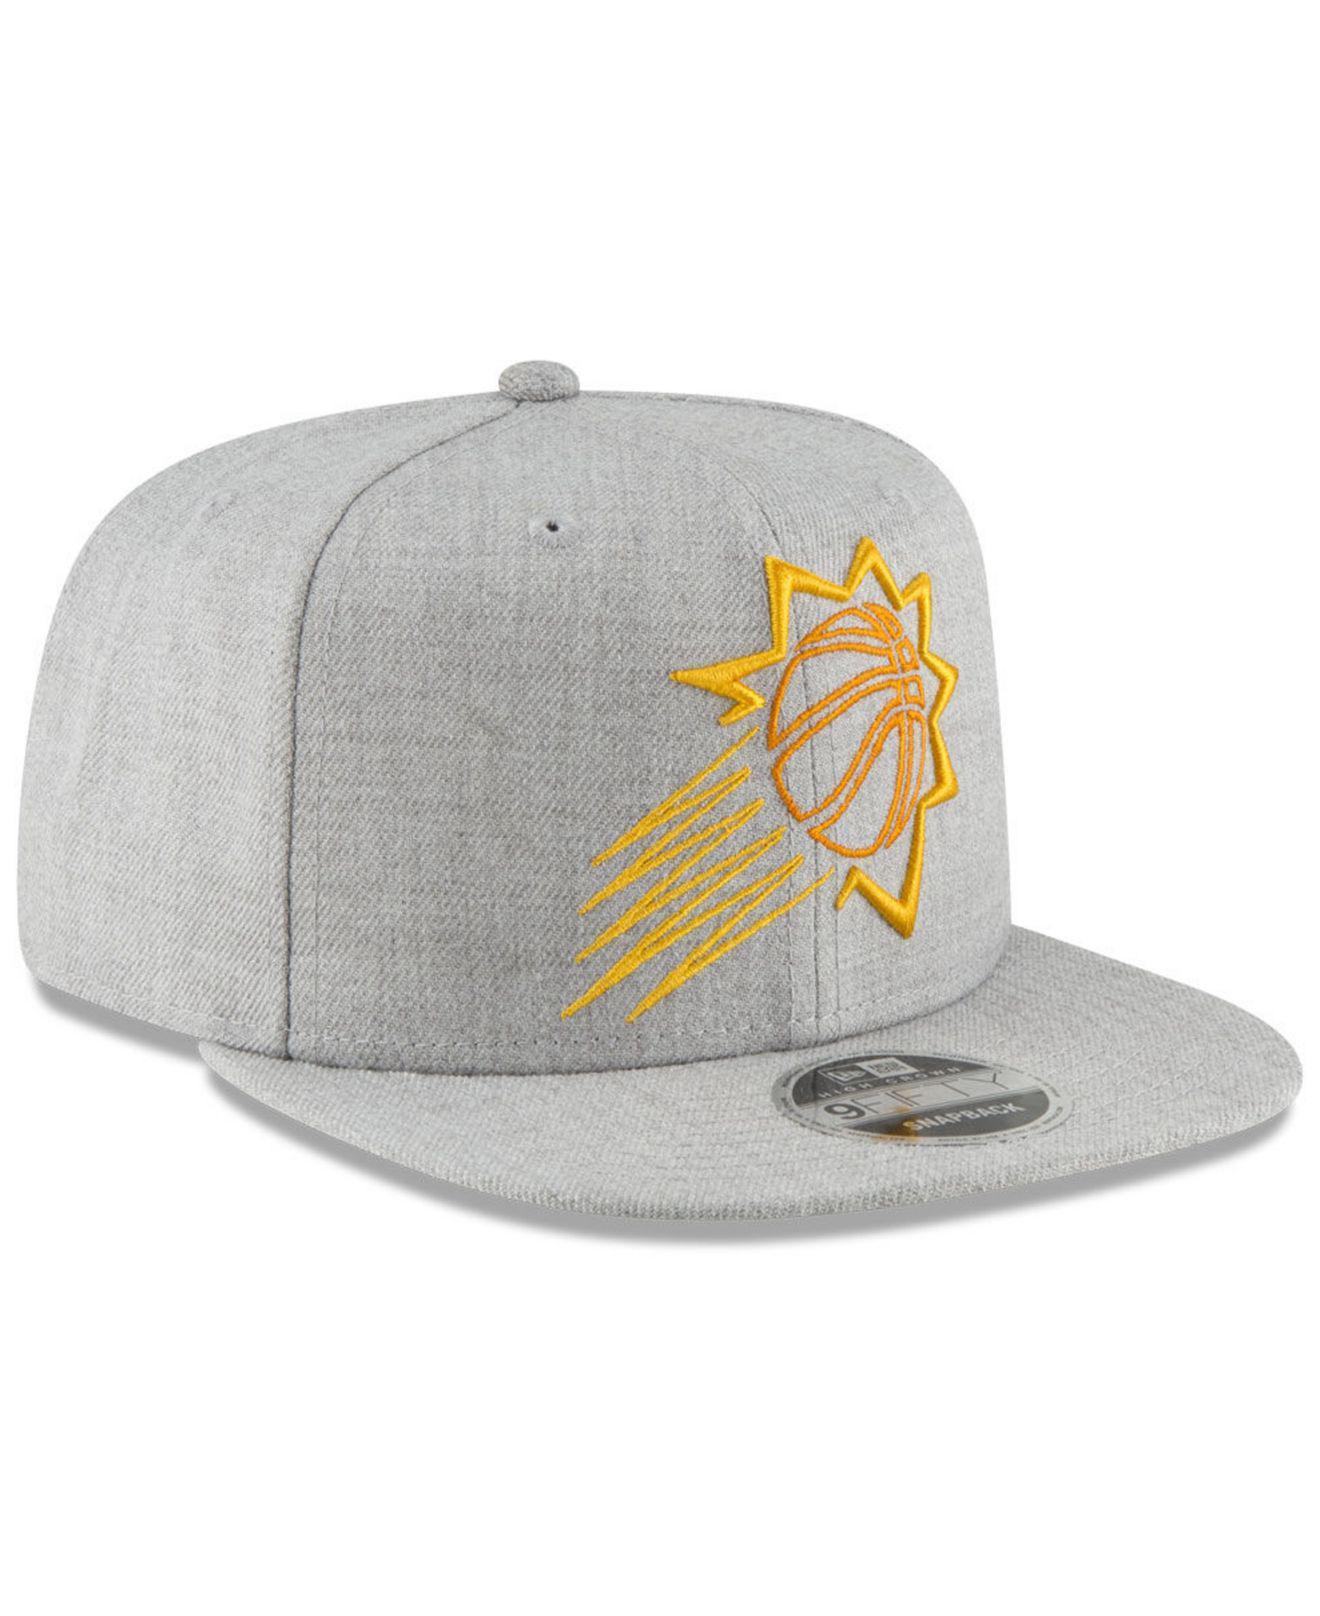 reputable site 77404 699fa ... Phoenix Suns Logo Trace 9fifty Snapback Cap for Men - Lyst. View  fullscreen